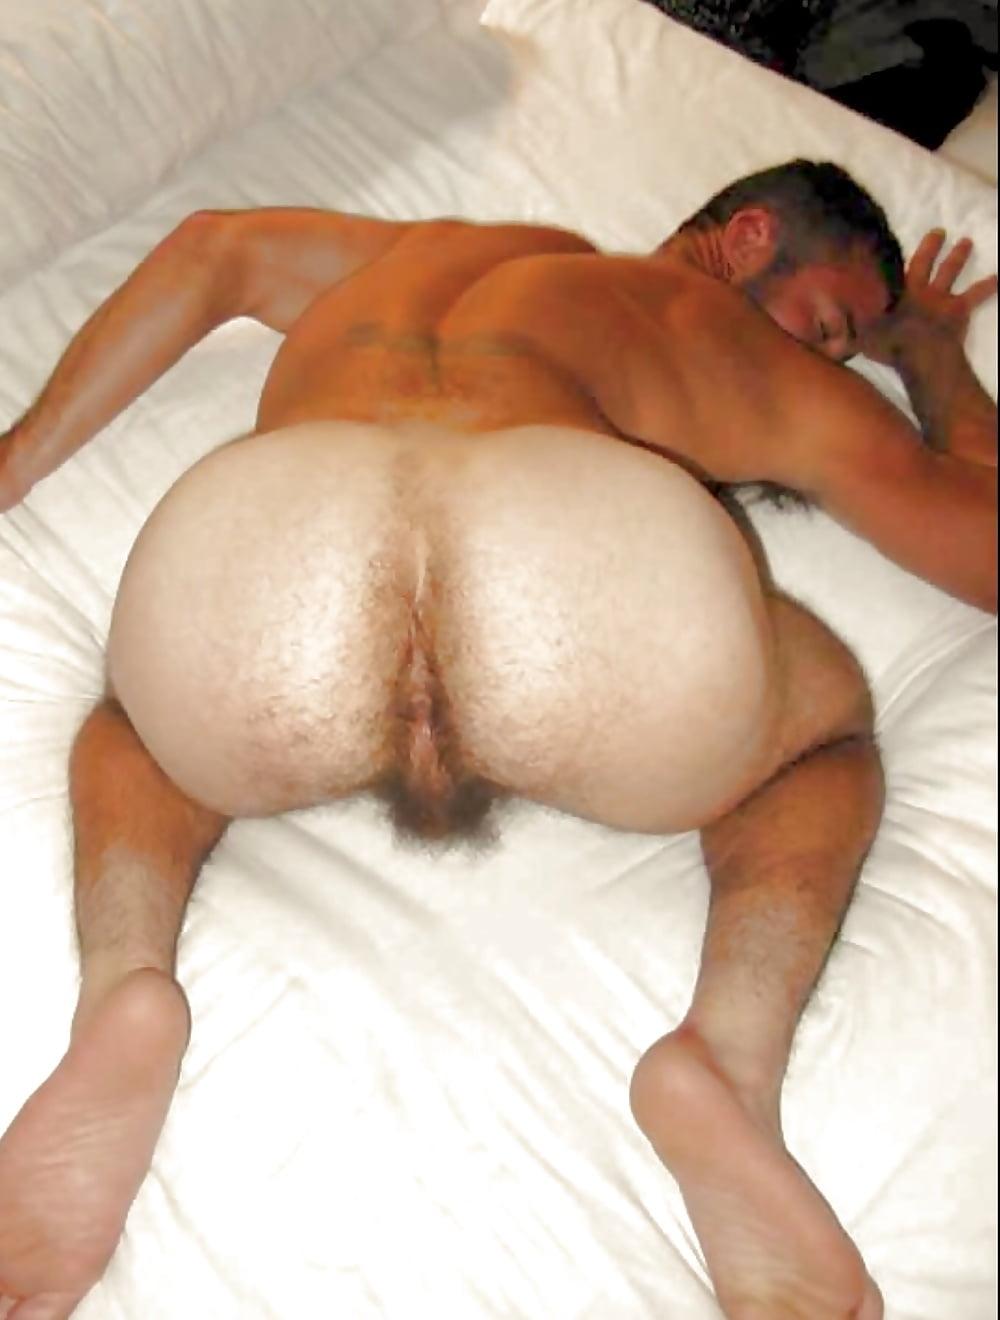 Hairy ass men nude, asain hot girls nude gallery